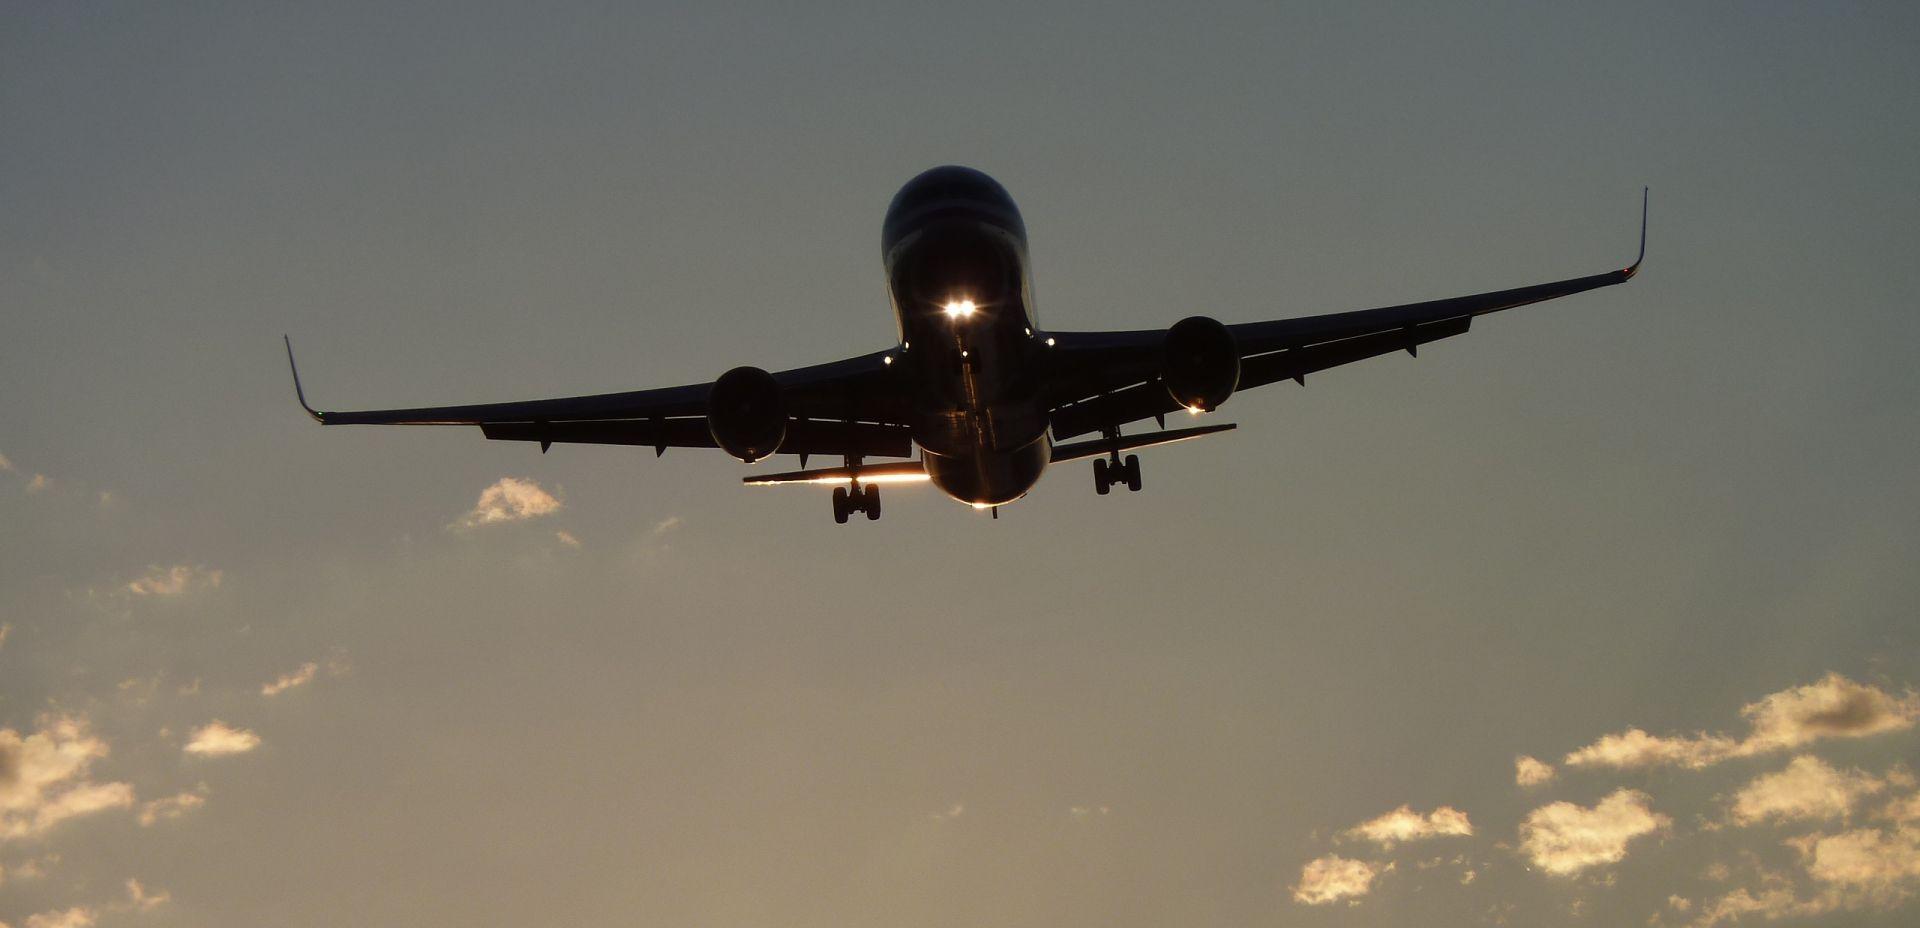 Zrakoplov Croatia Airlinesa iz Dubrovnika za Zagreb sletio – u Rimu